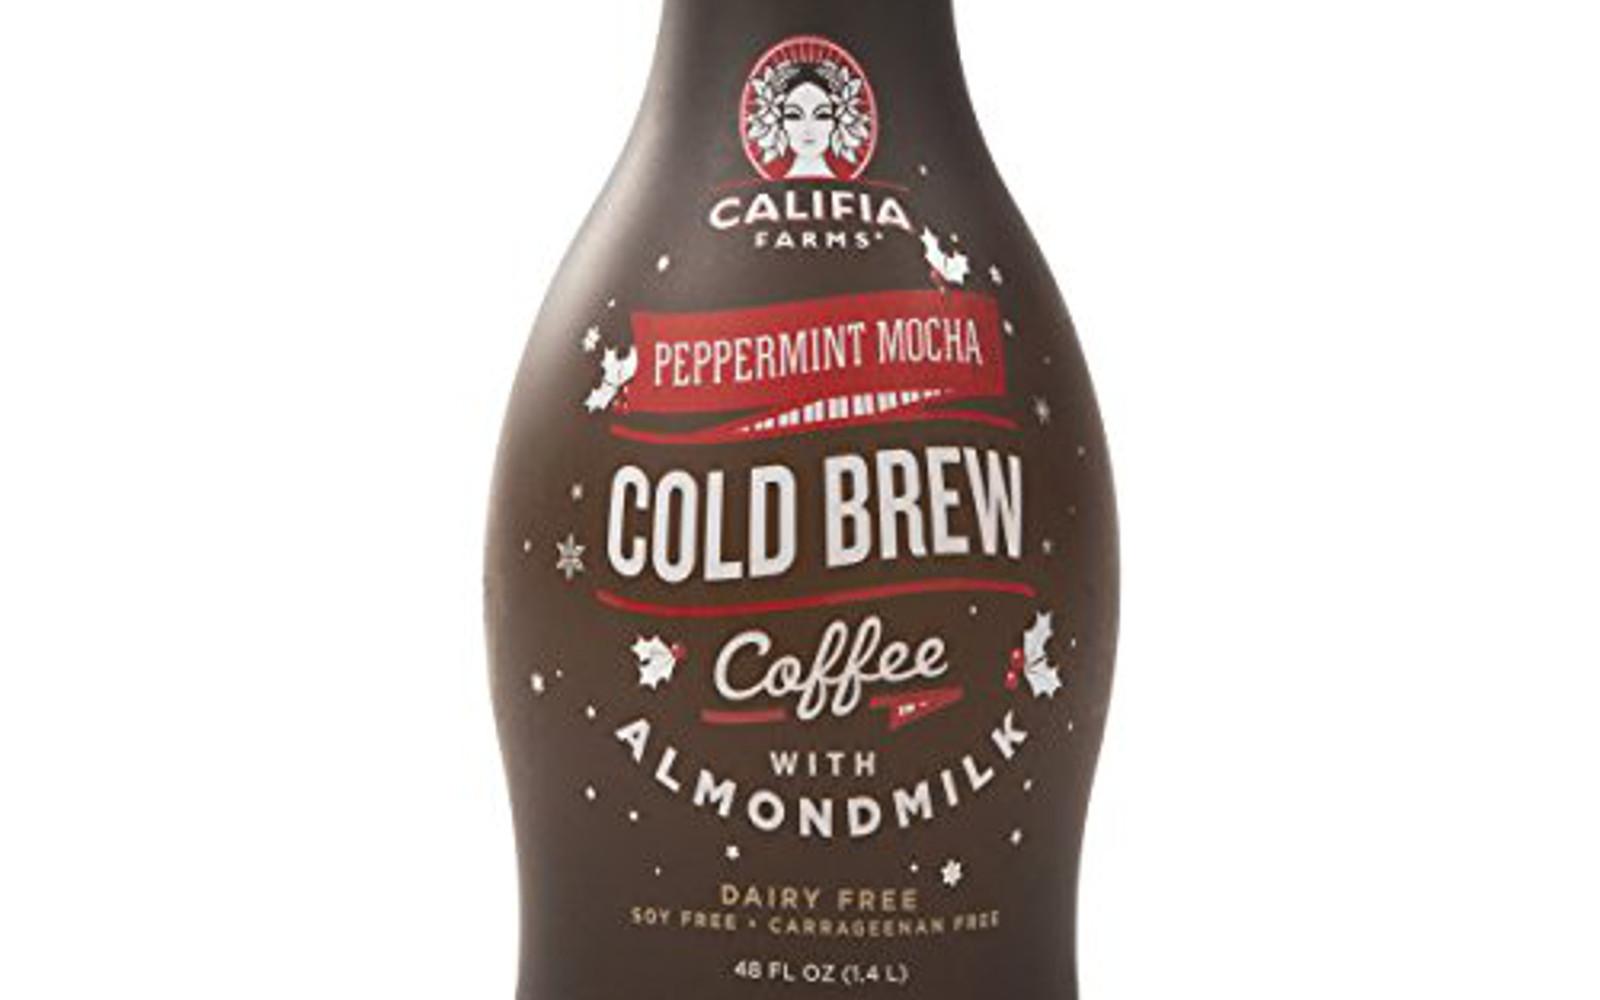 Califia Farms Cold Brew Coffee with Almondmilk, Seasonal Peppermint Mocha, 48 Ounce